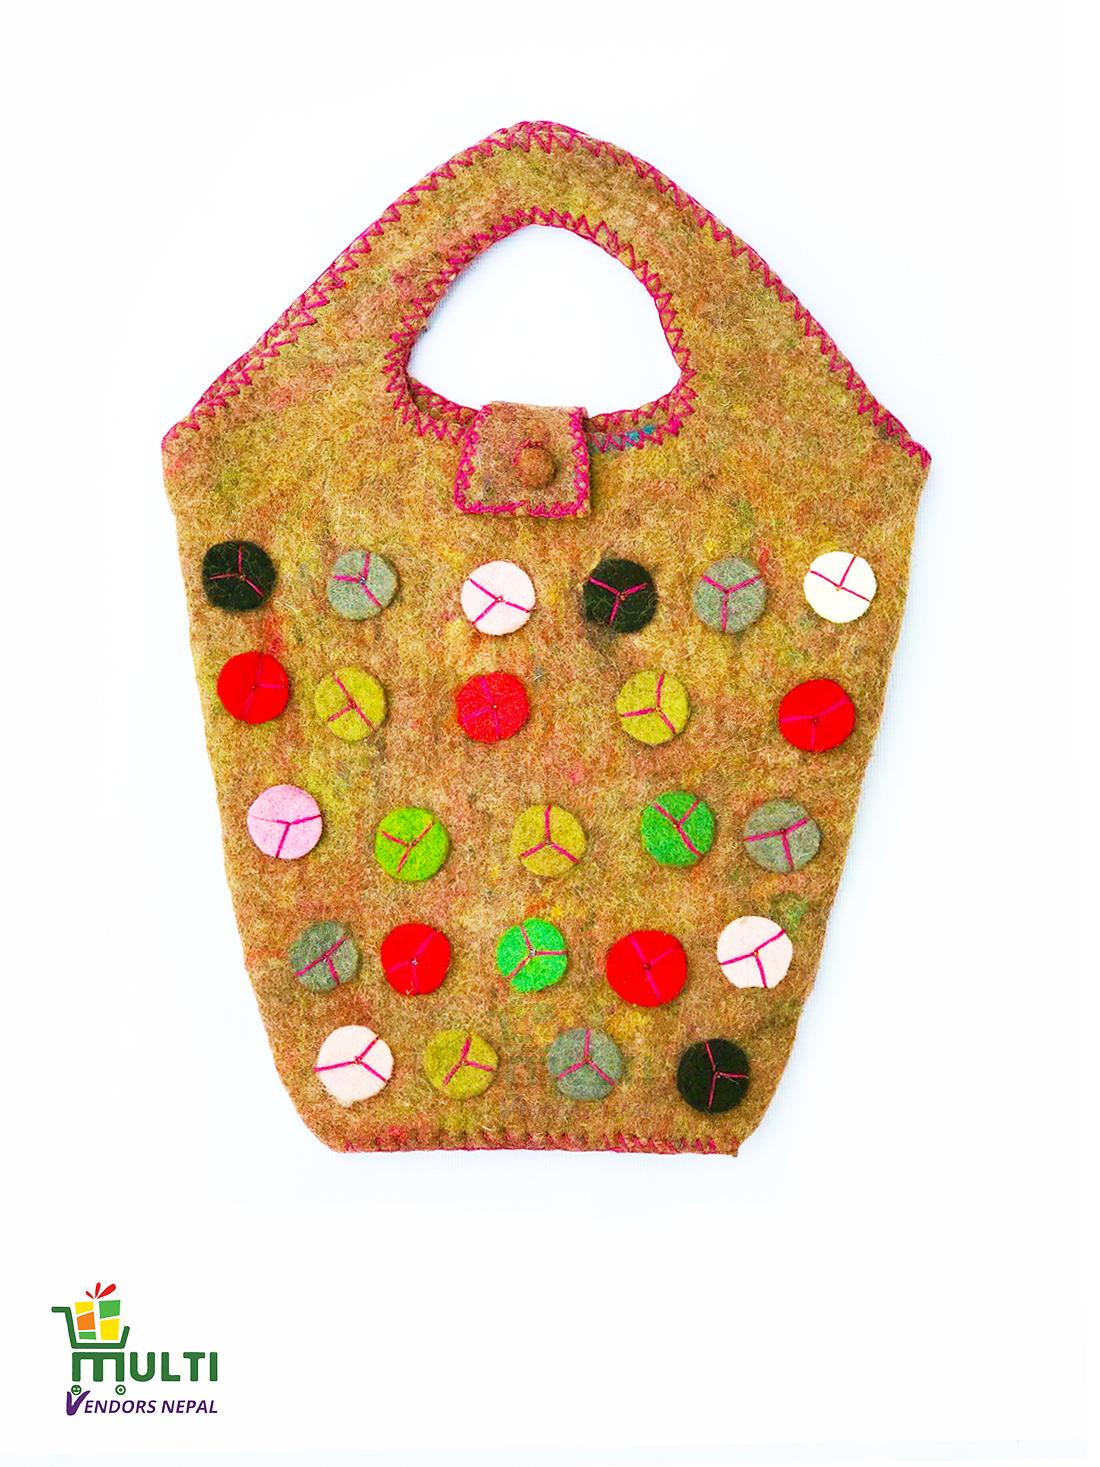 Handy Decorated Kids Bag -M.V.K.S-185-C